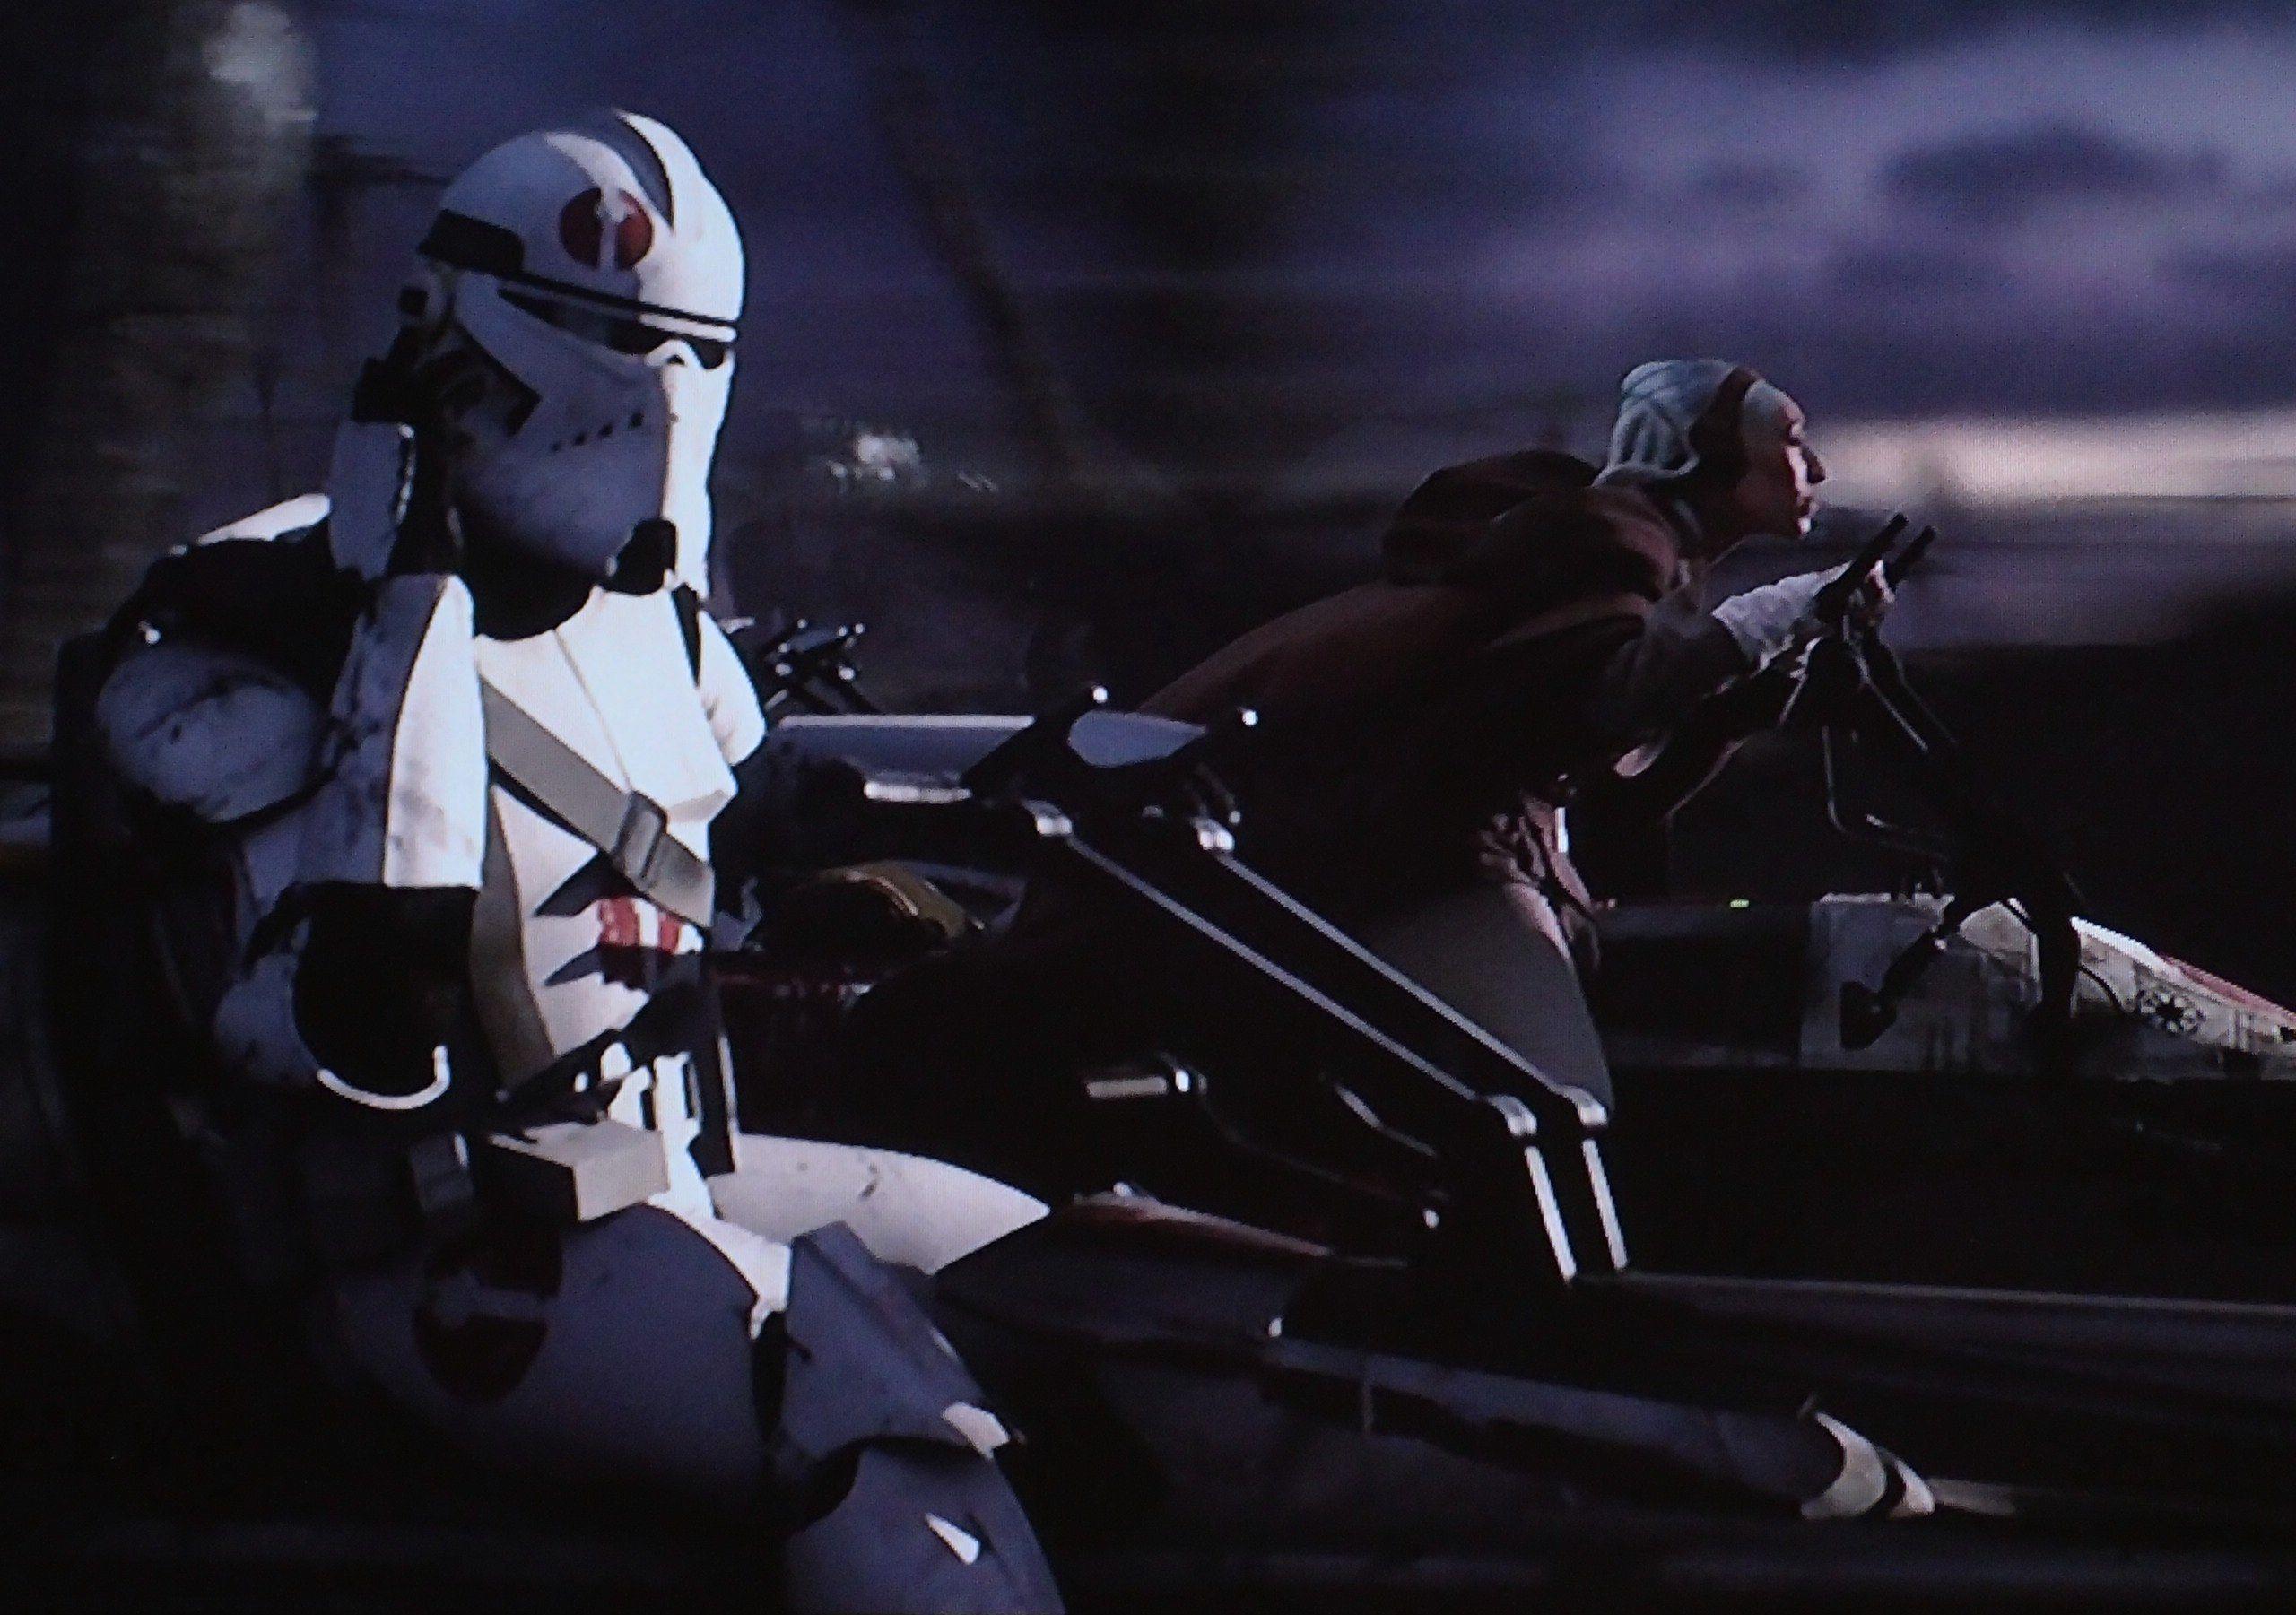 Star Wars Clone Trooper Wallpapers Wallpaper Cave